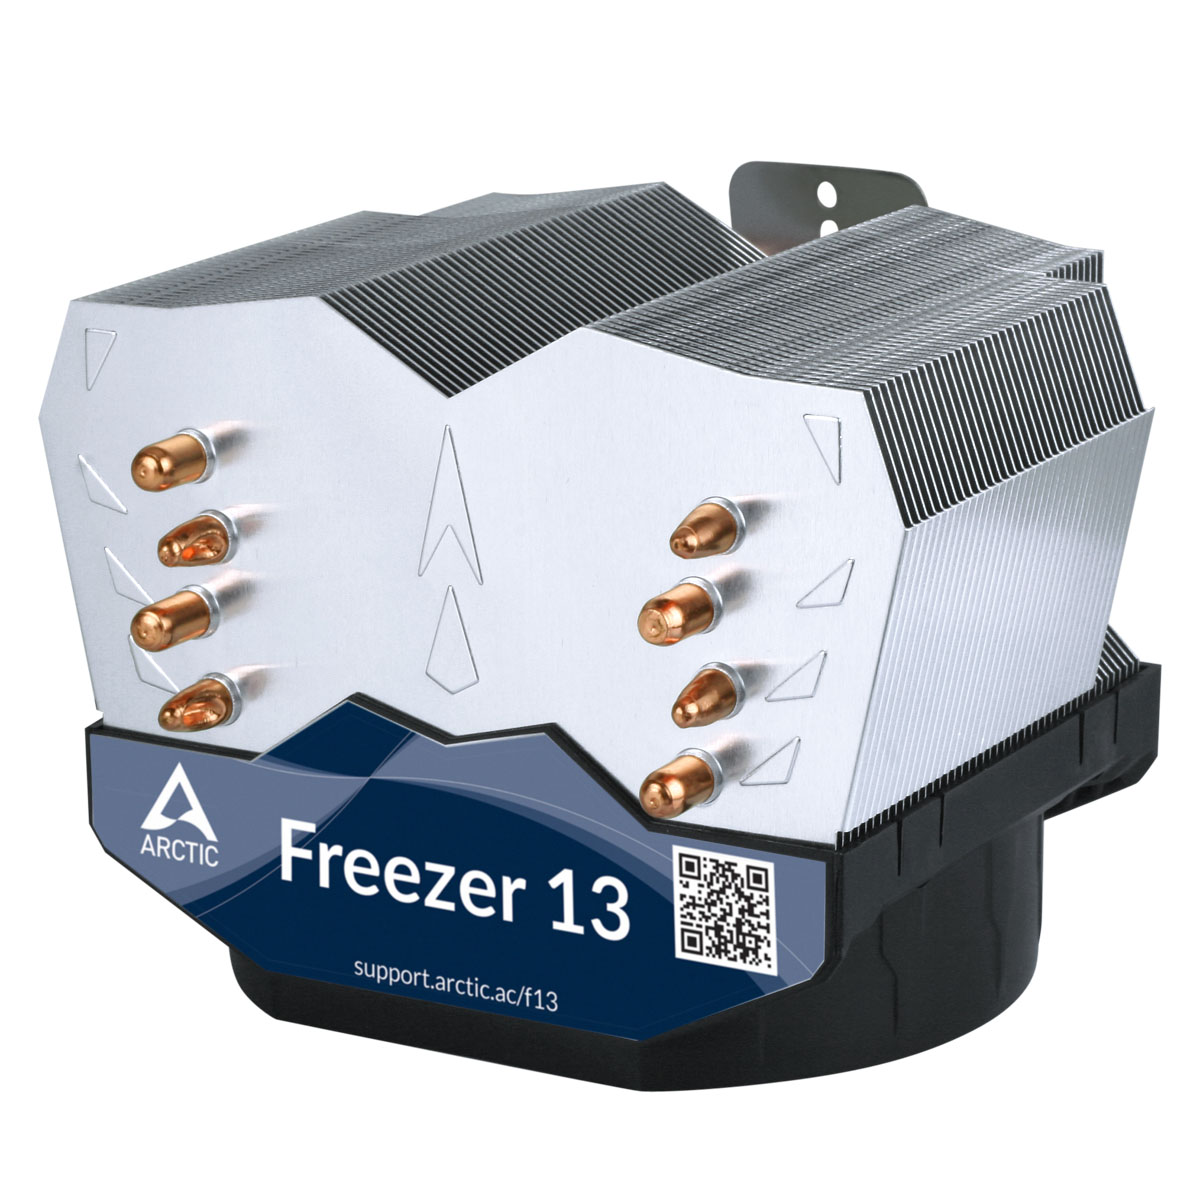 Freezer 13